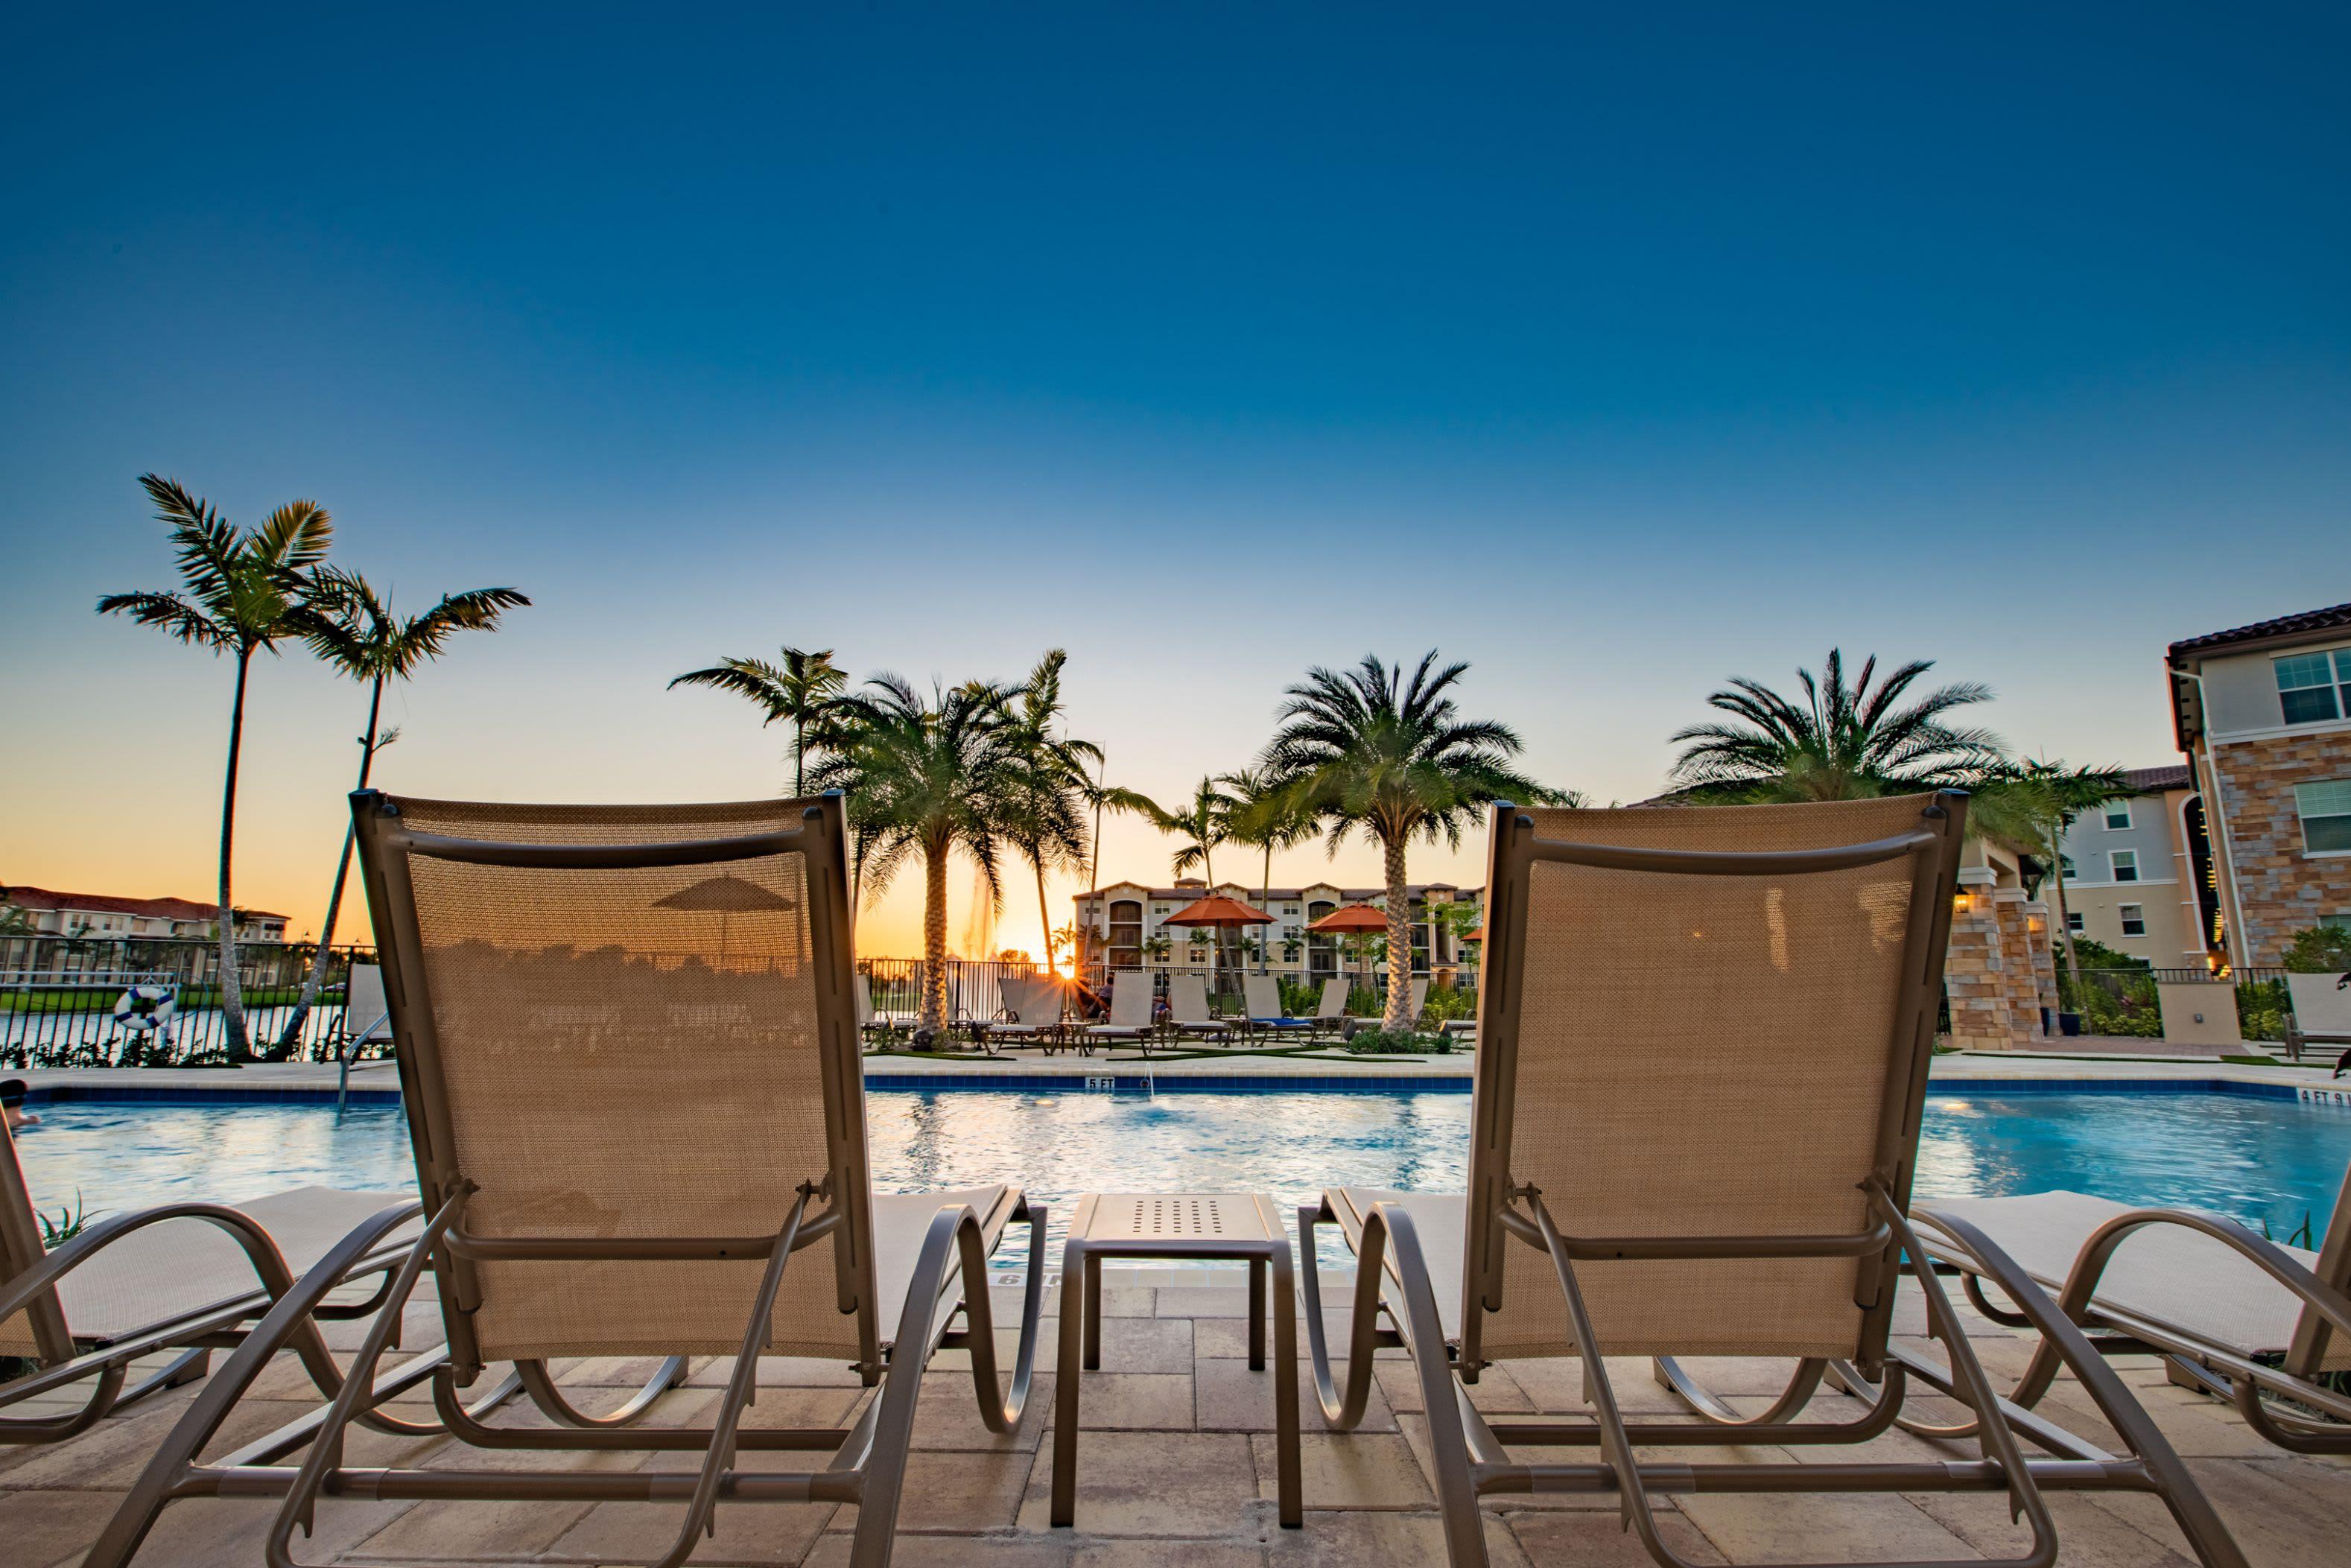 Beautiful Pool Area at Luma Miramar Apartments in Miramar, Florida